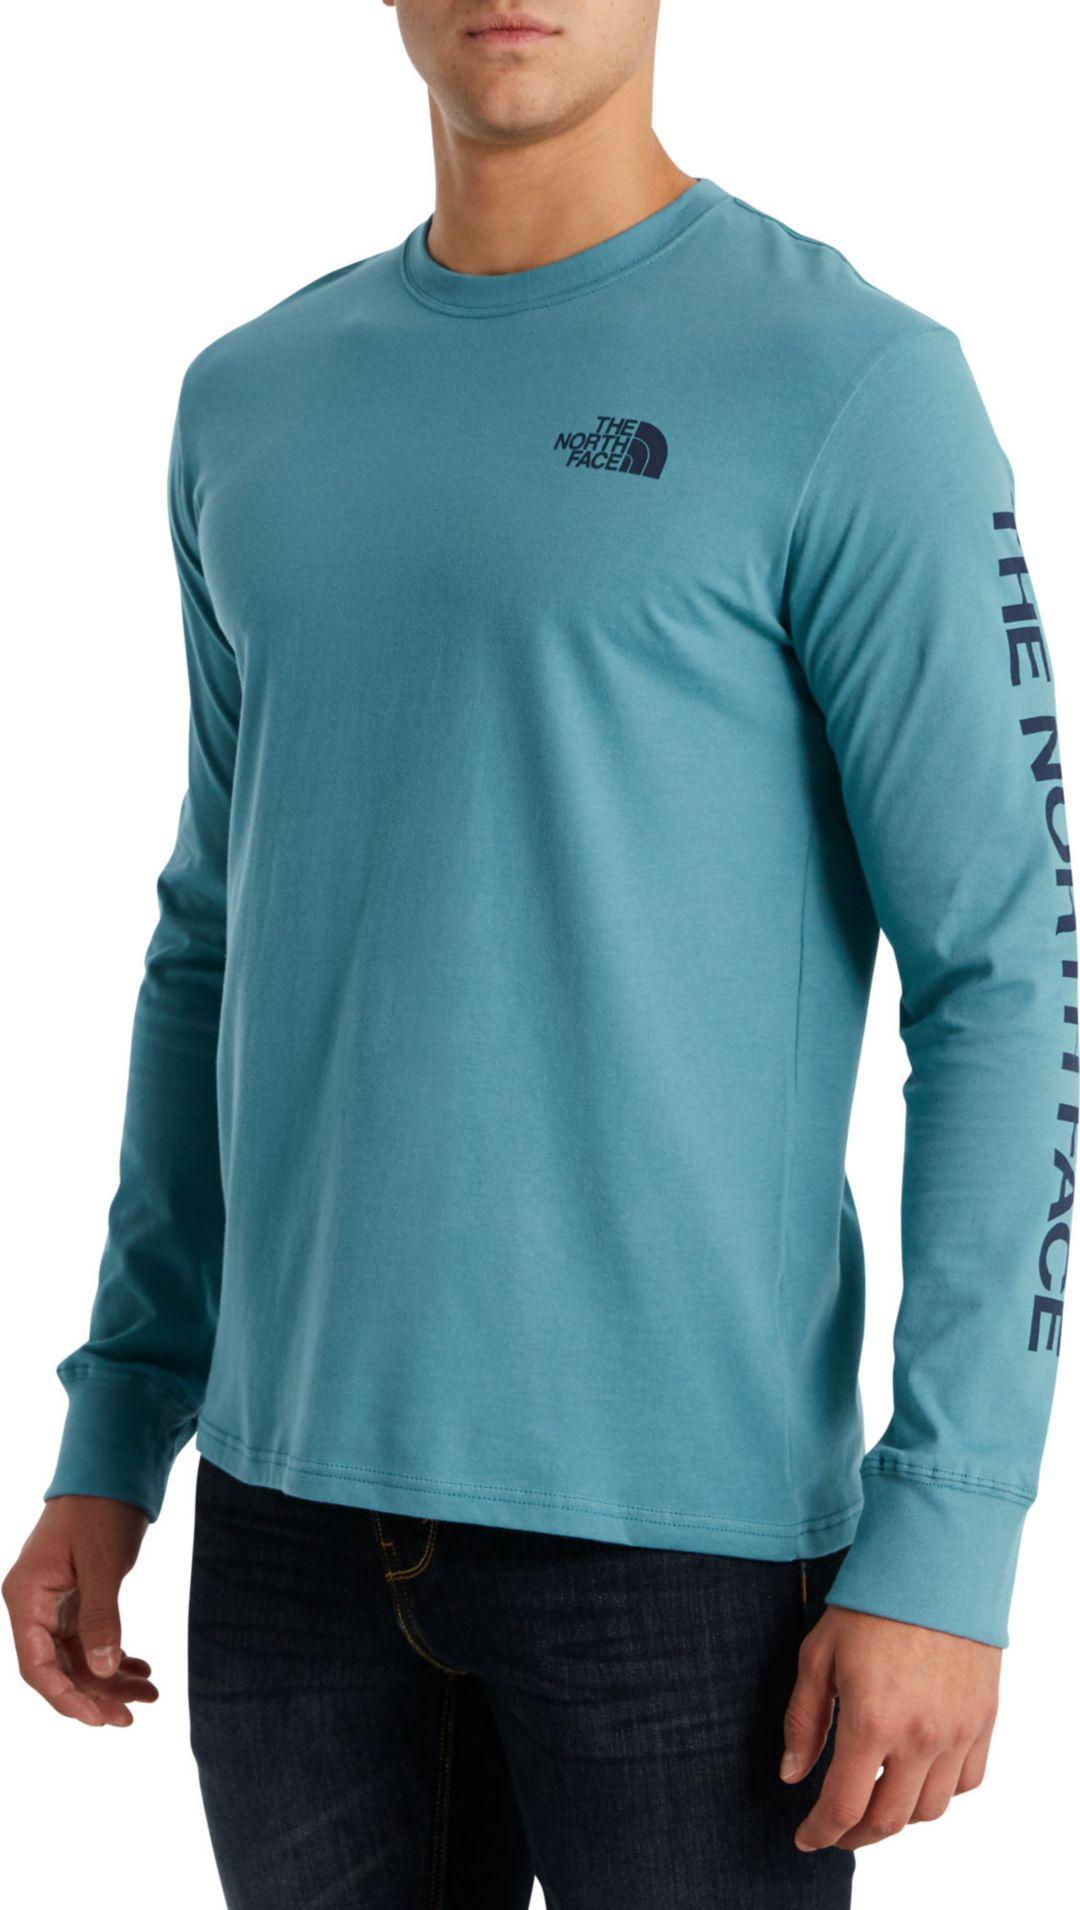 d762f2518 The North Face Men's Crew Long Sleeve Shirt